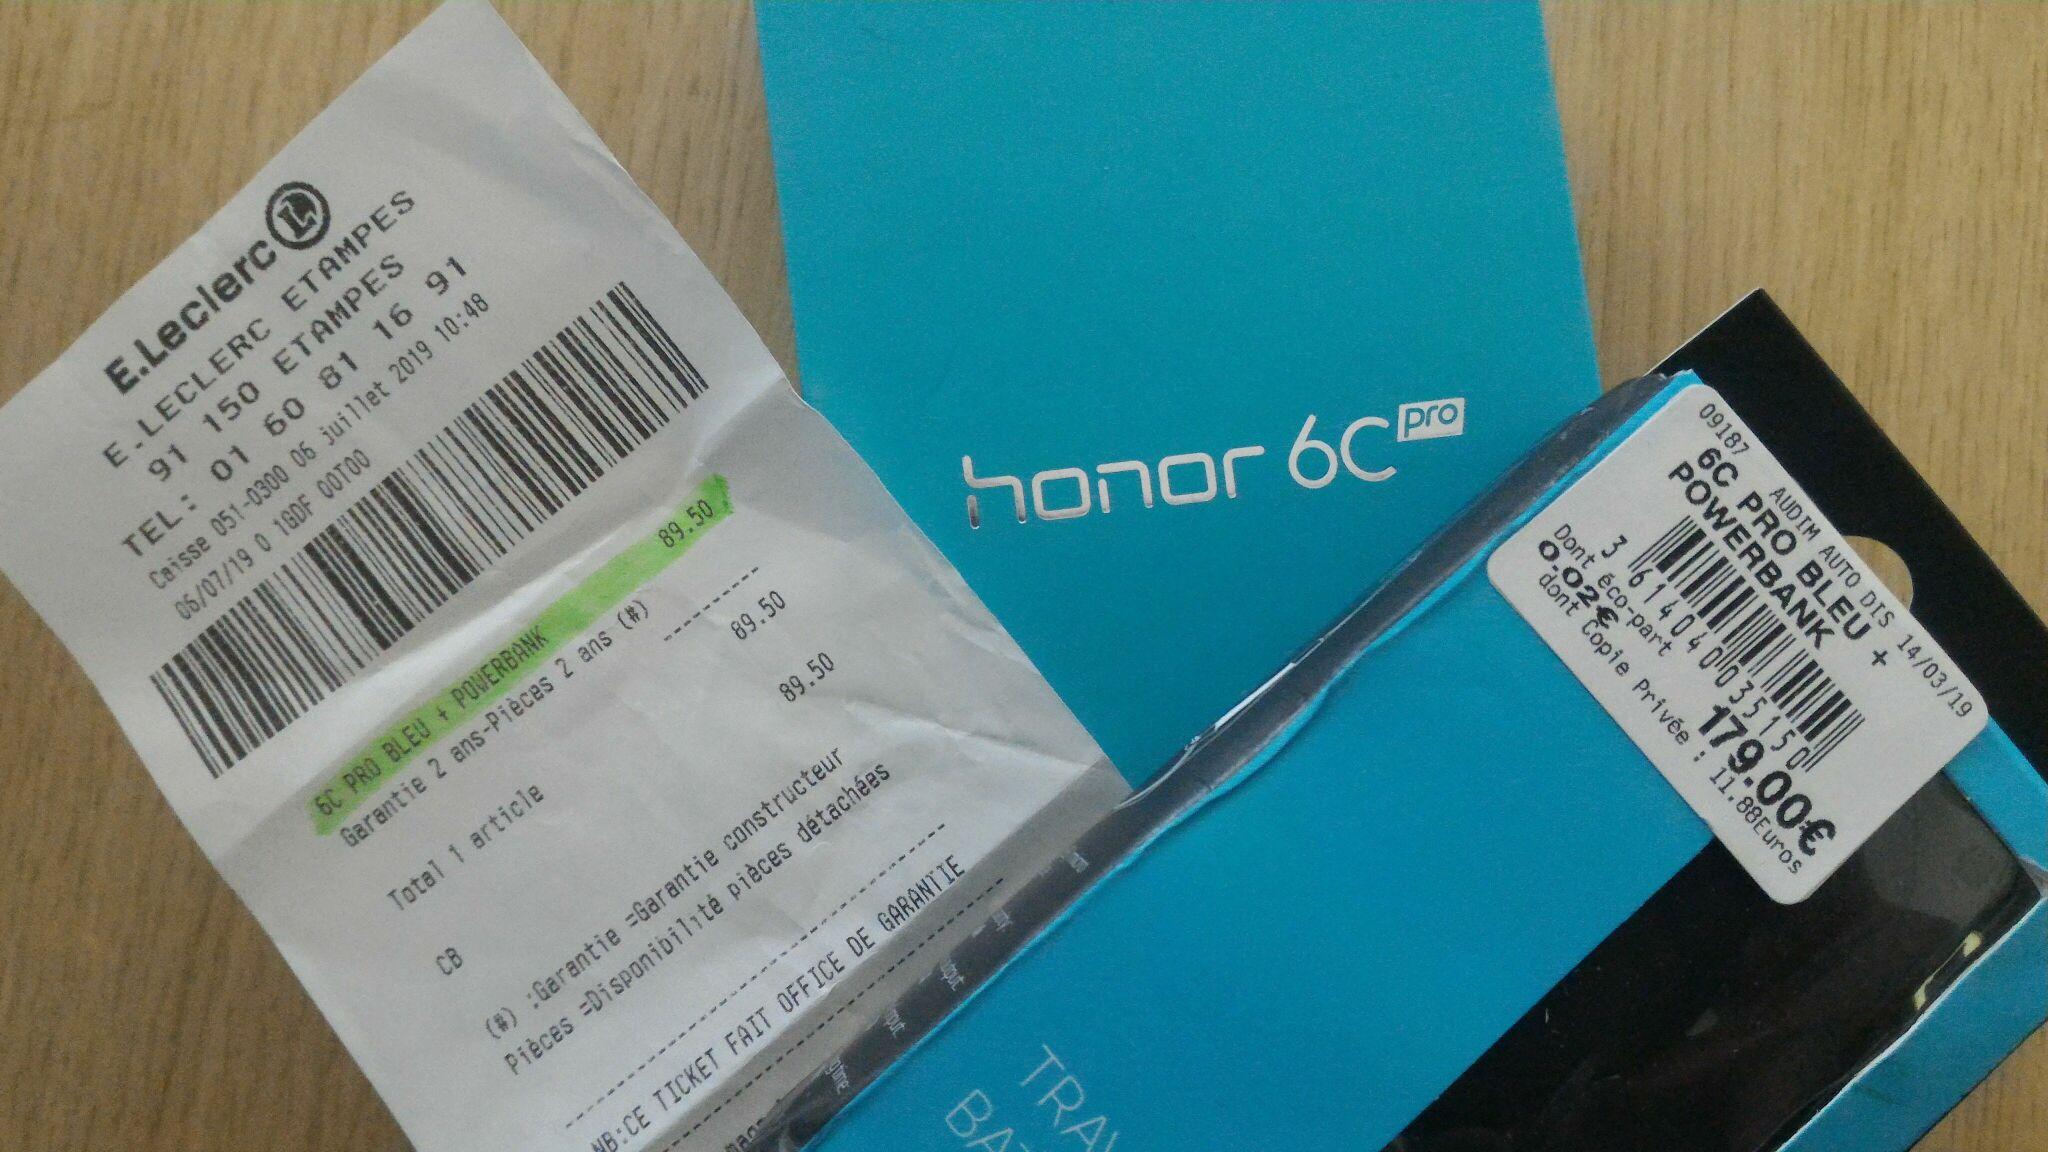 "Smartphone 5,2"" Honor 6C Pro - 3Go RAM, 32Go, Dual SIM, Bleu + Batterie externe 2600 mAh - Étampes (91)"